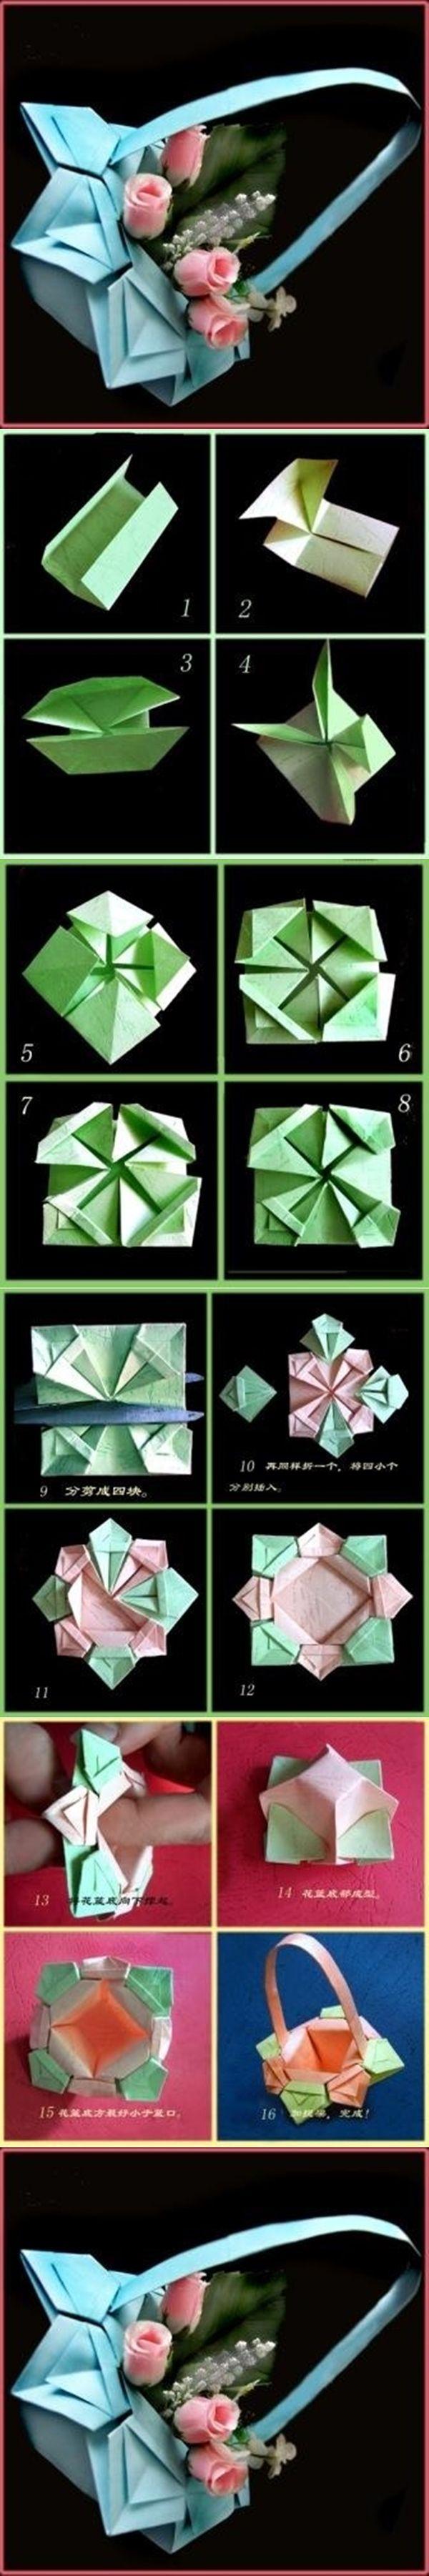 DIY Origami Paper Basket | www.FabArtDIY.com LIKE Us on Facebook ==> https://www.facebook.com/FabArtDIY